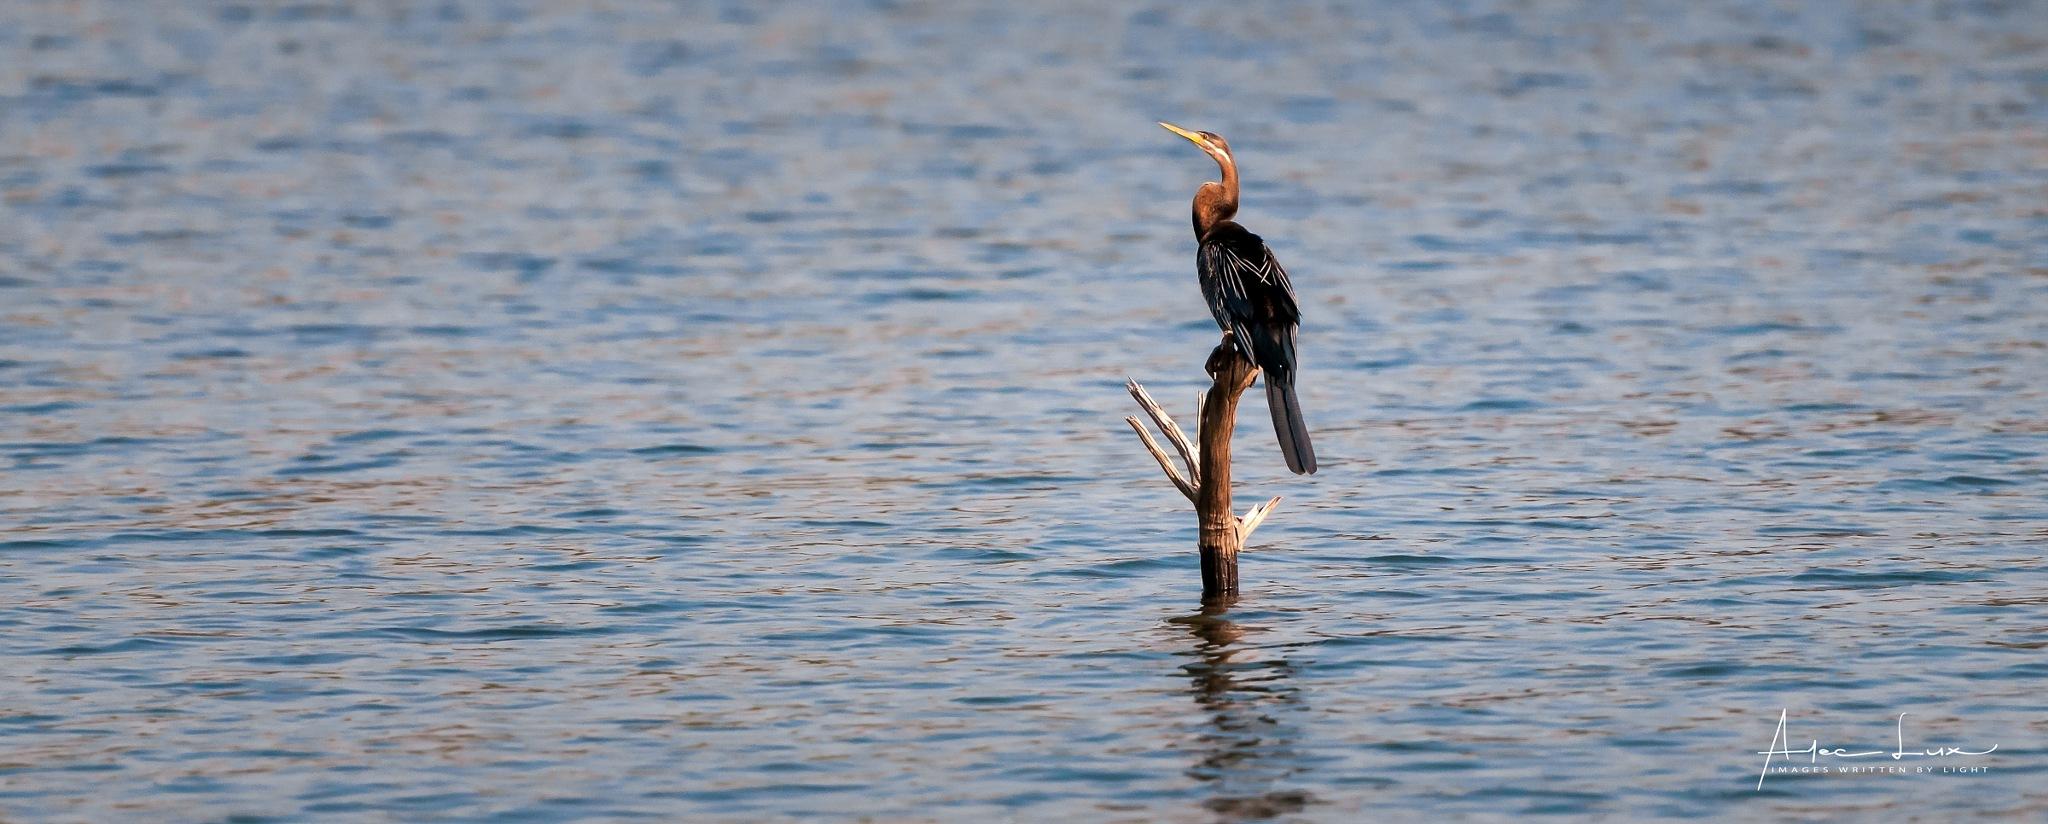 Birding On Lake Kariba 1 by Alec Lux